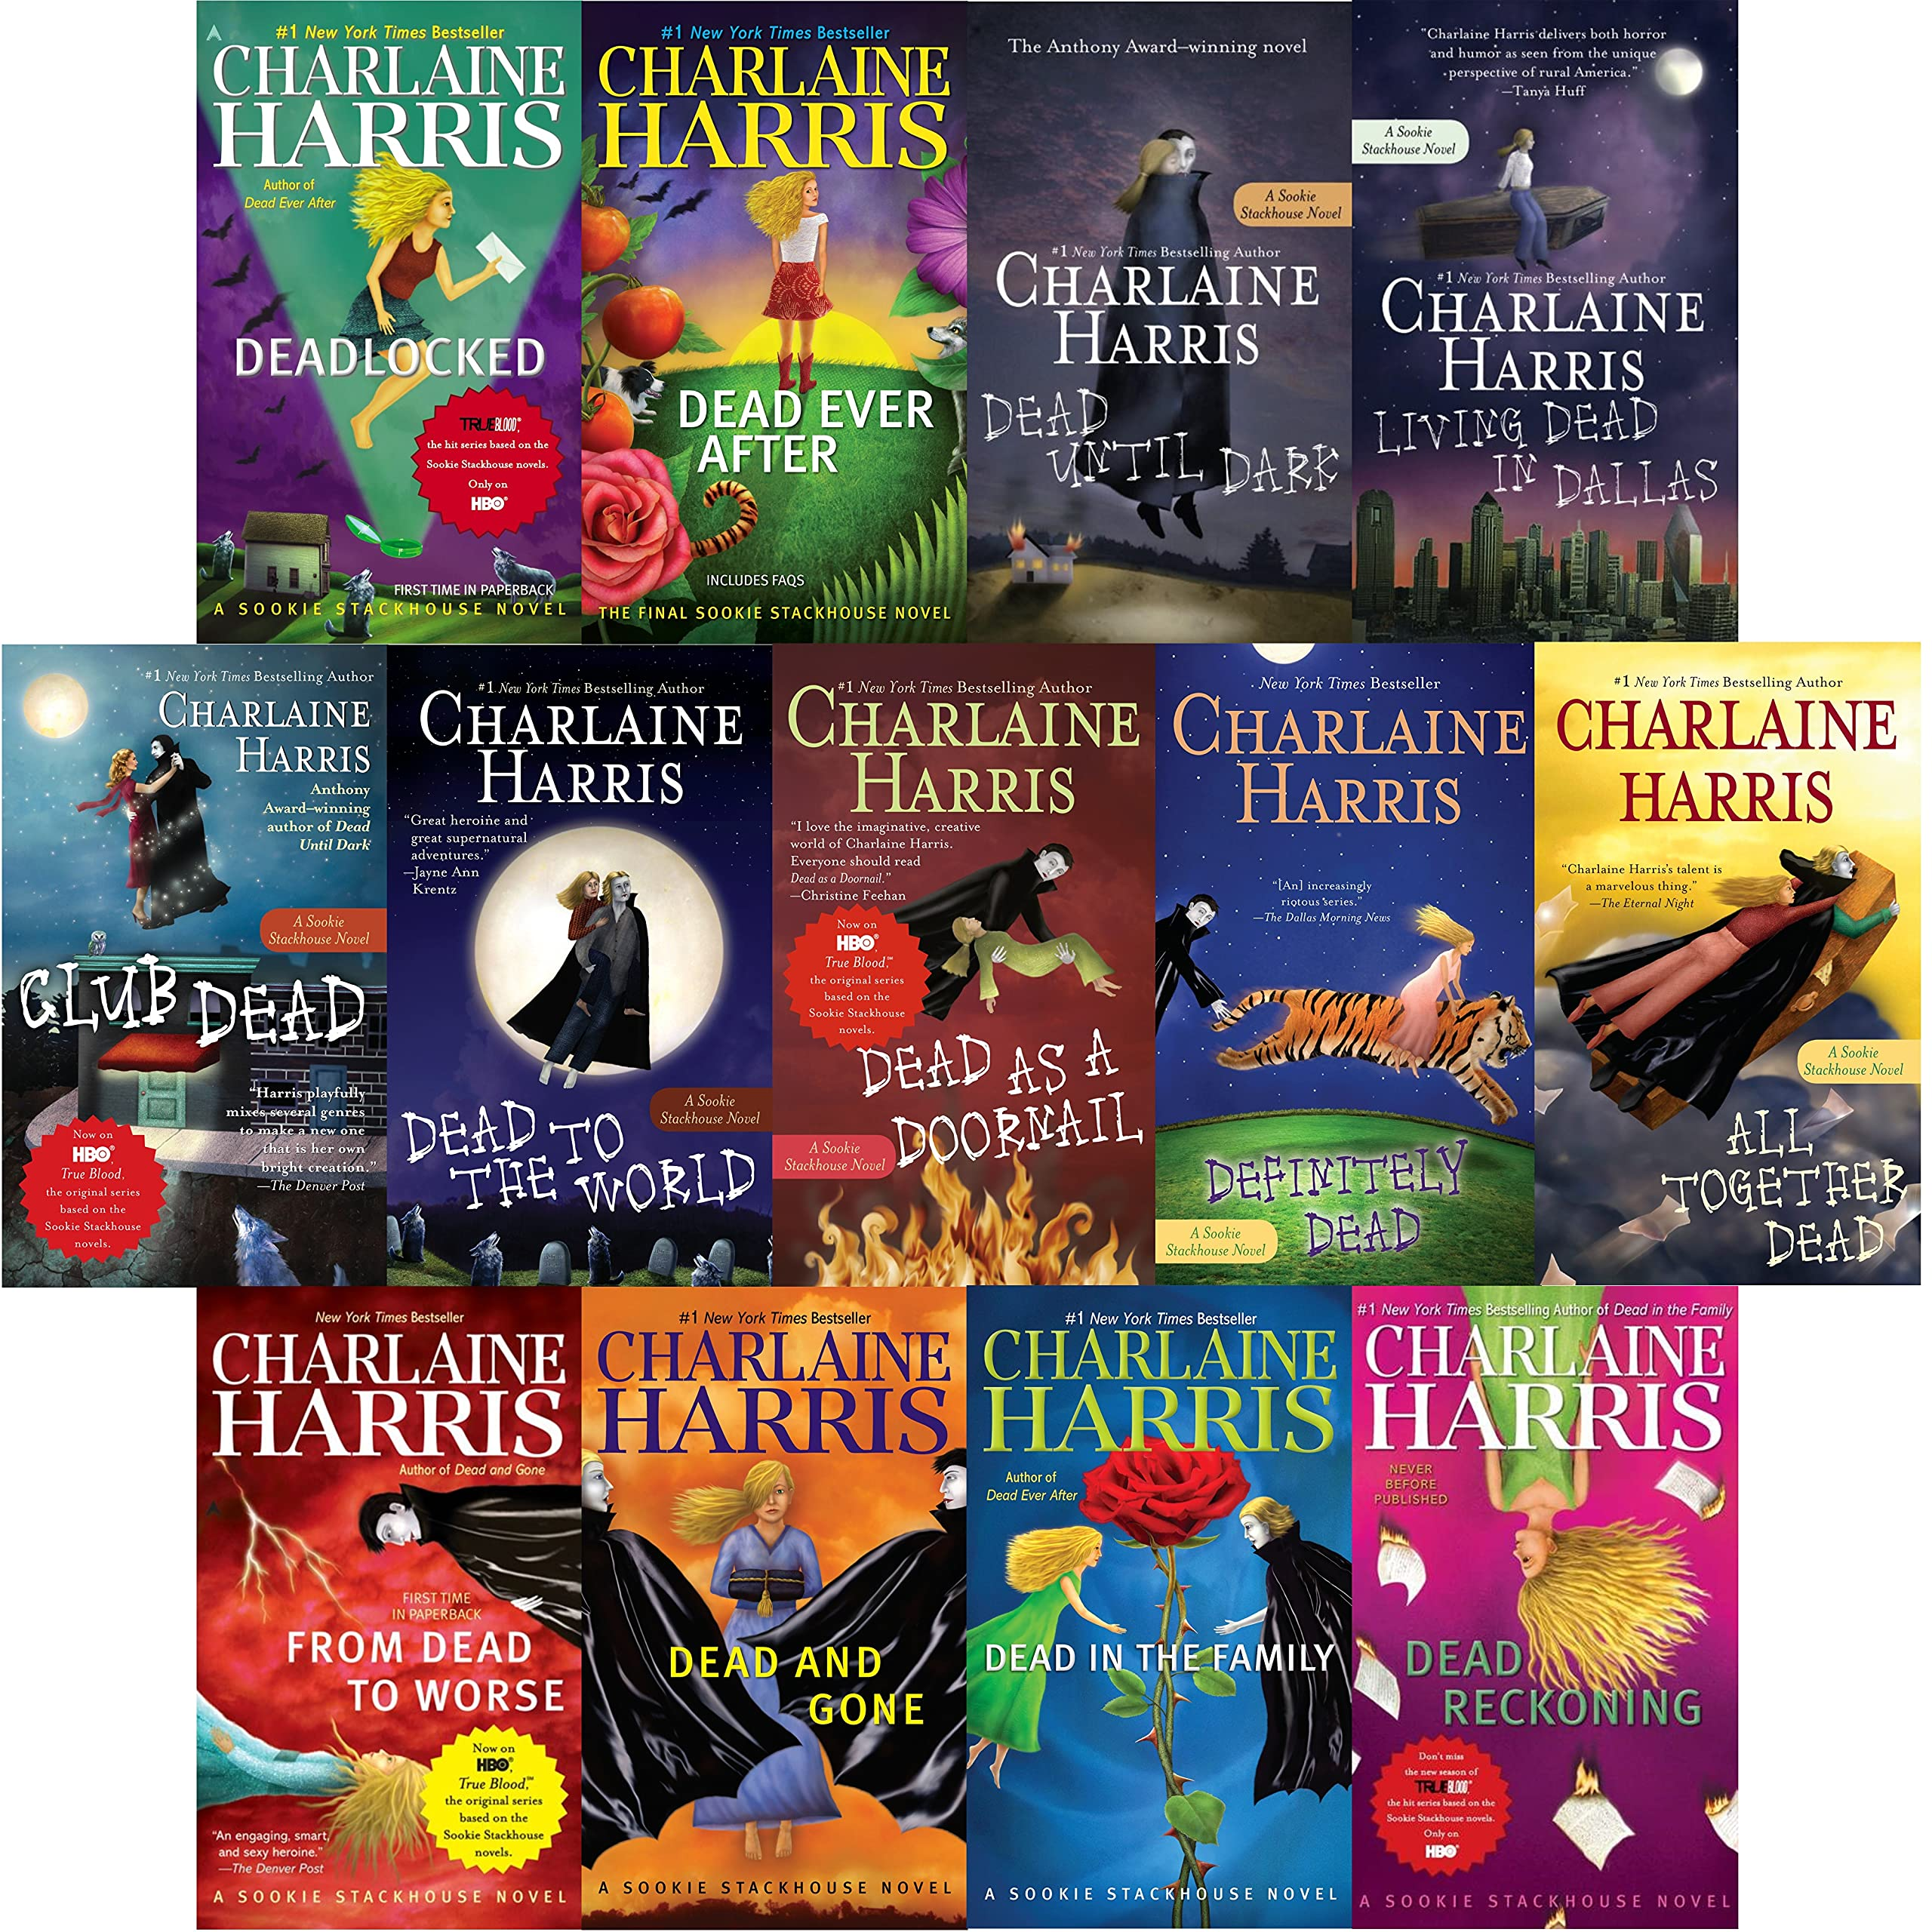 Charlaine Harris's Sookie Stackhouse / True Blood (Complete Series: Books  1-13): 0722512567542: Amazon.com: Books